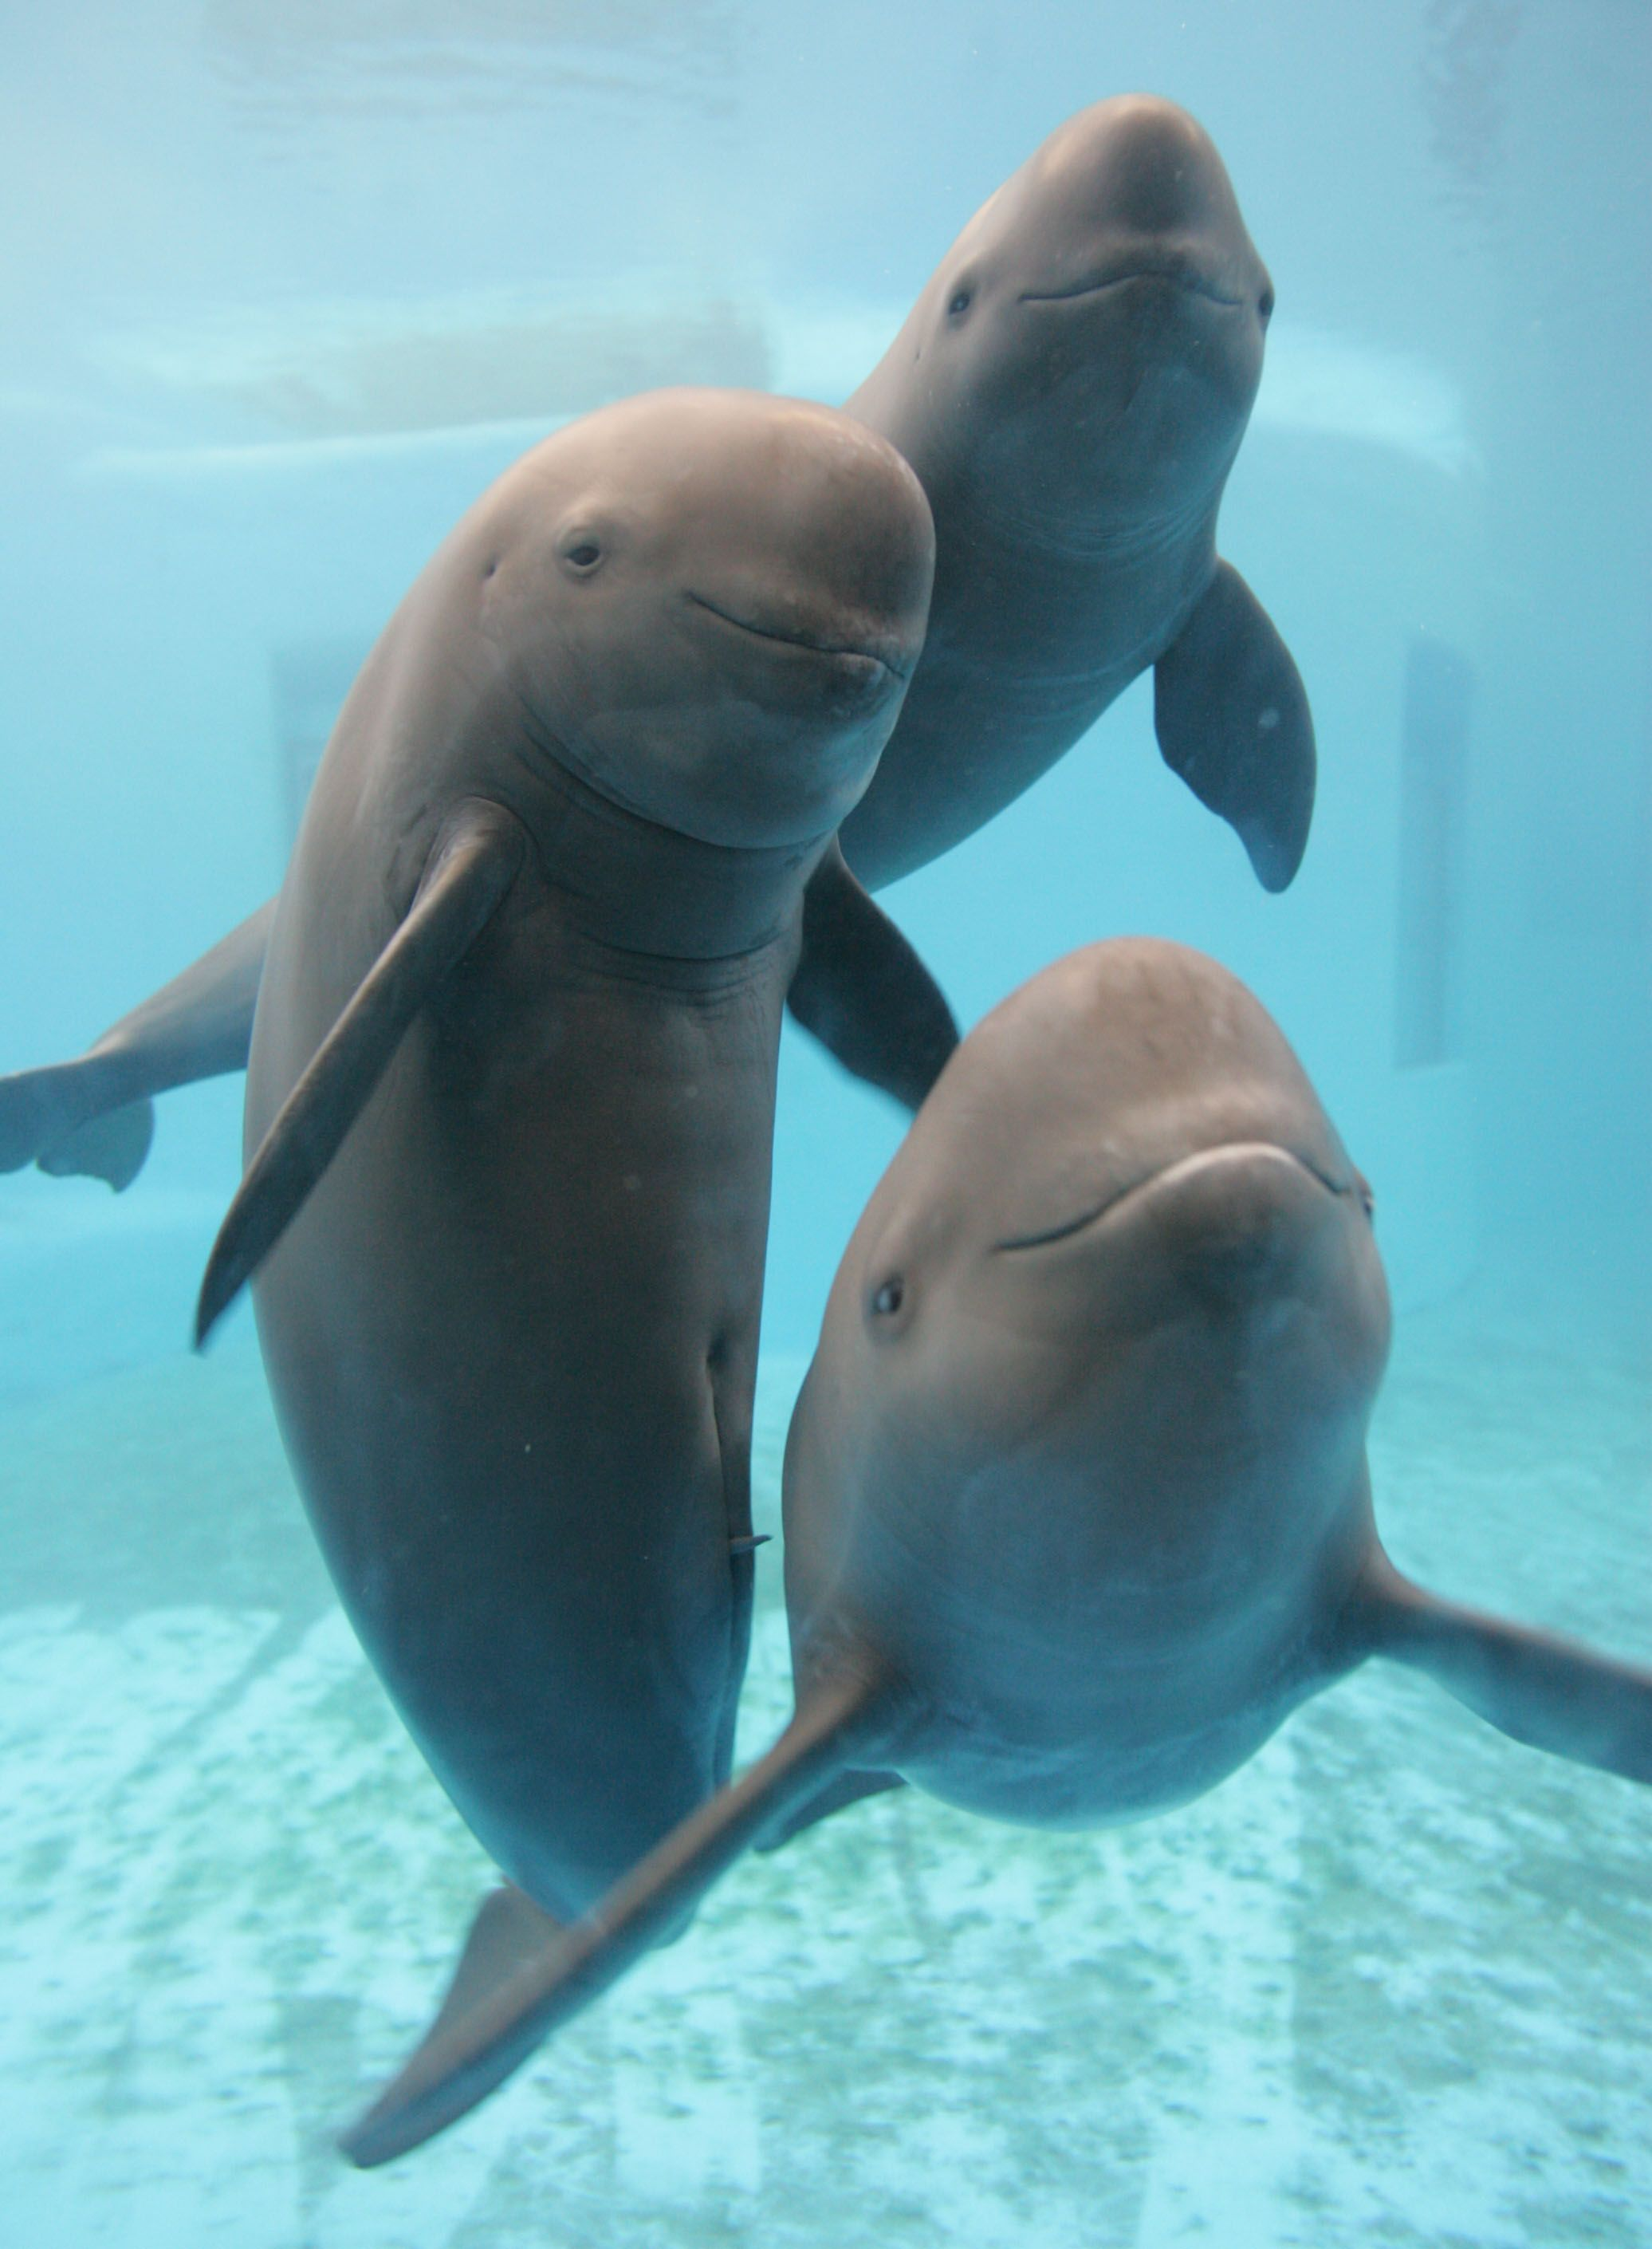 Yangtze finless porpoise population nosedives to 1,000 ...